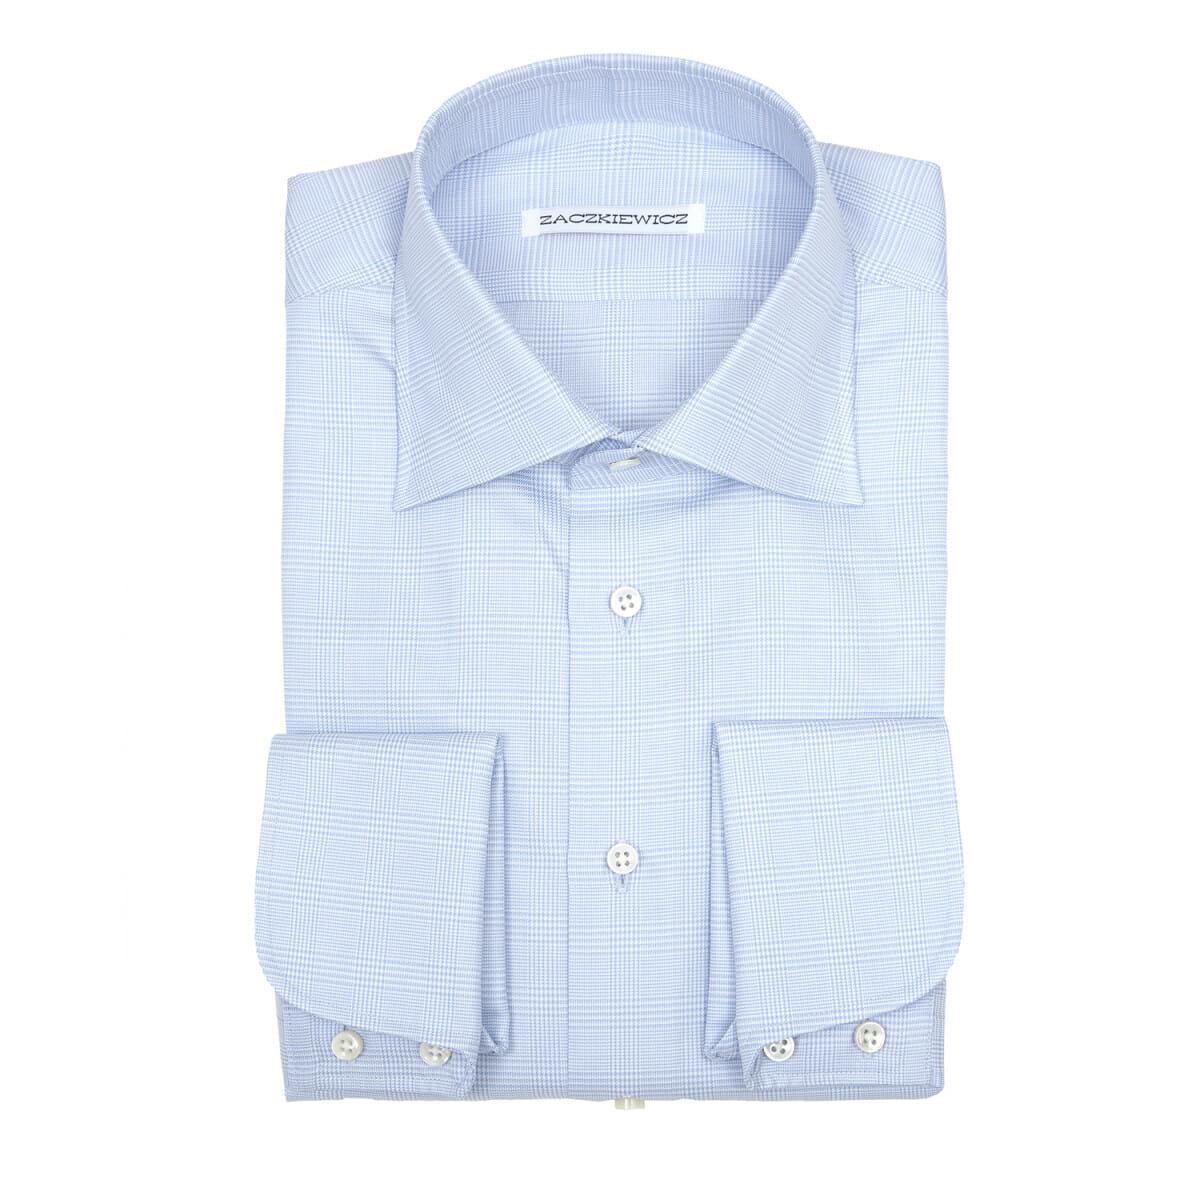 Błękitna koszula Książę Walii